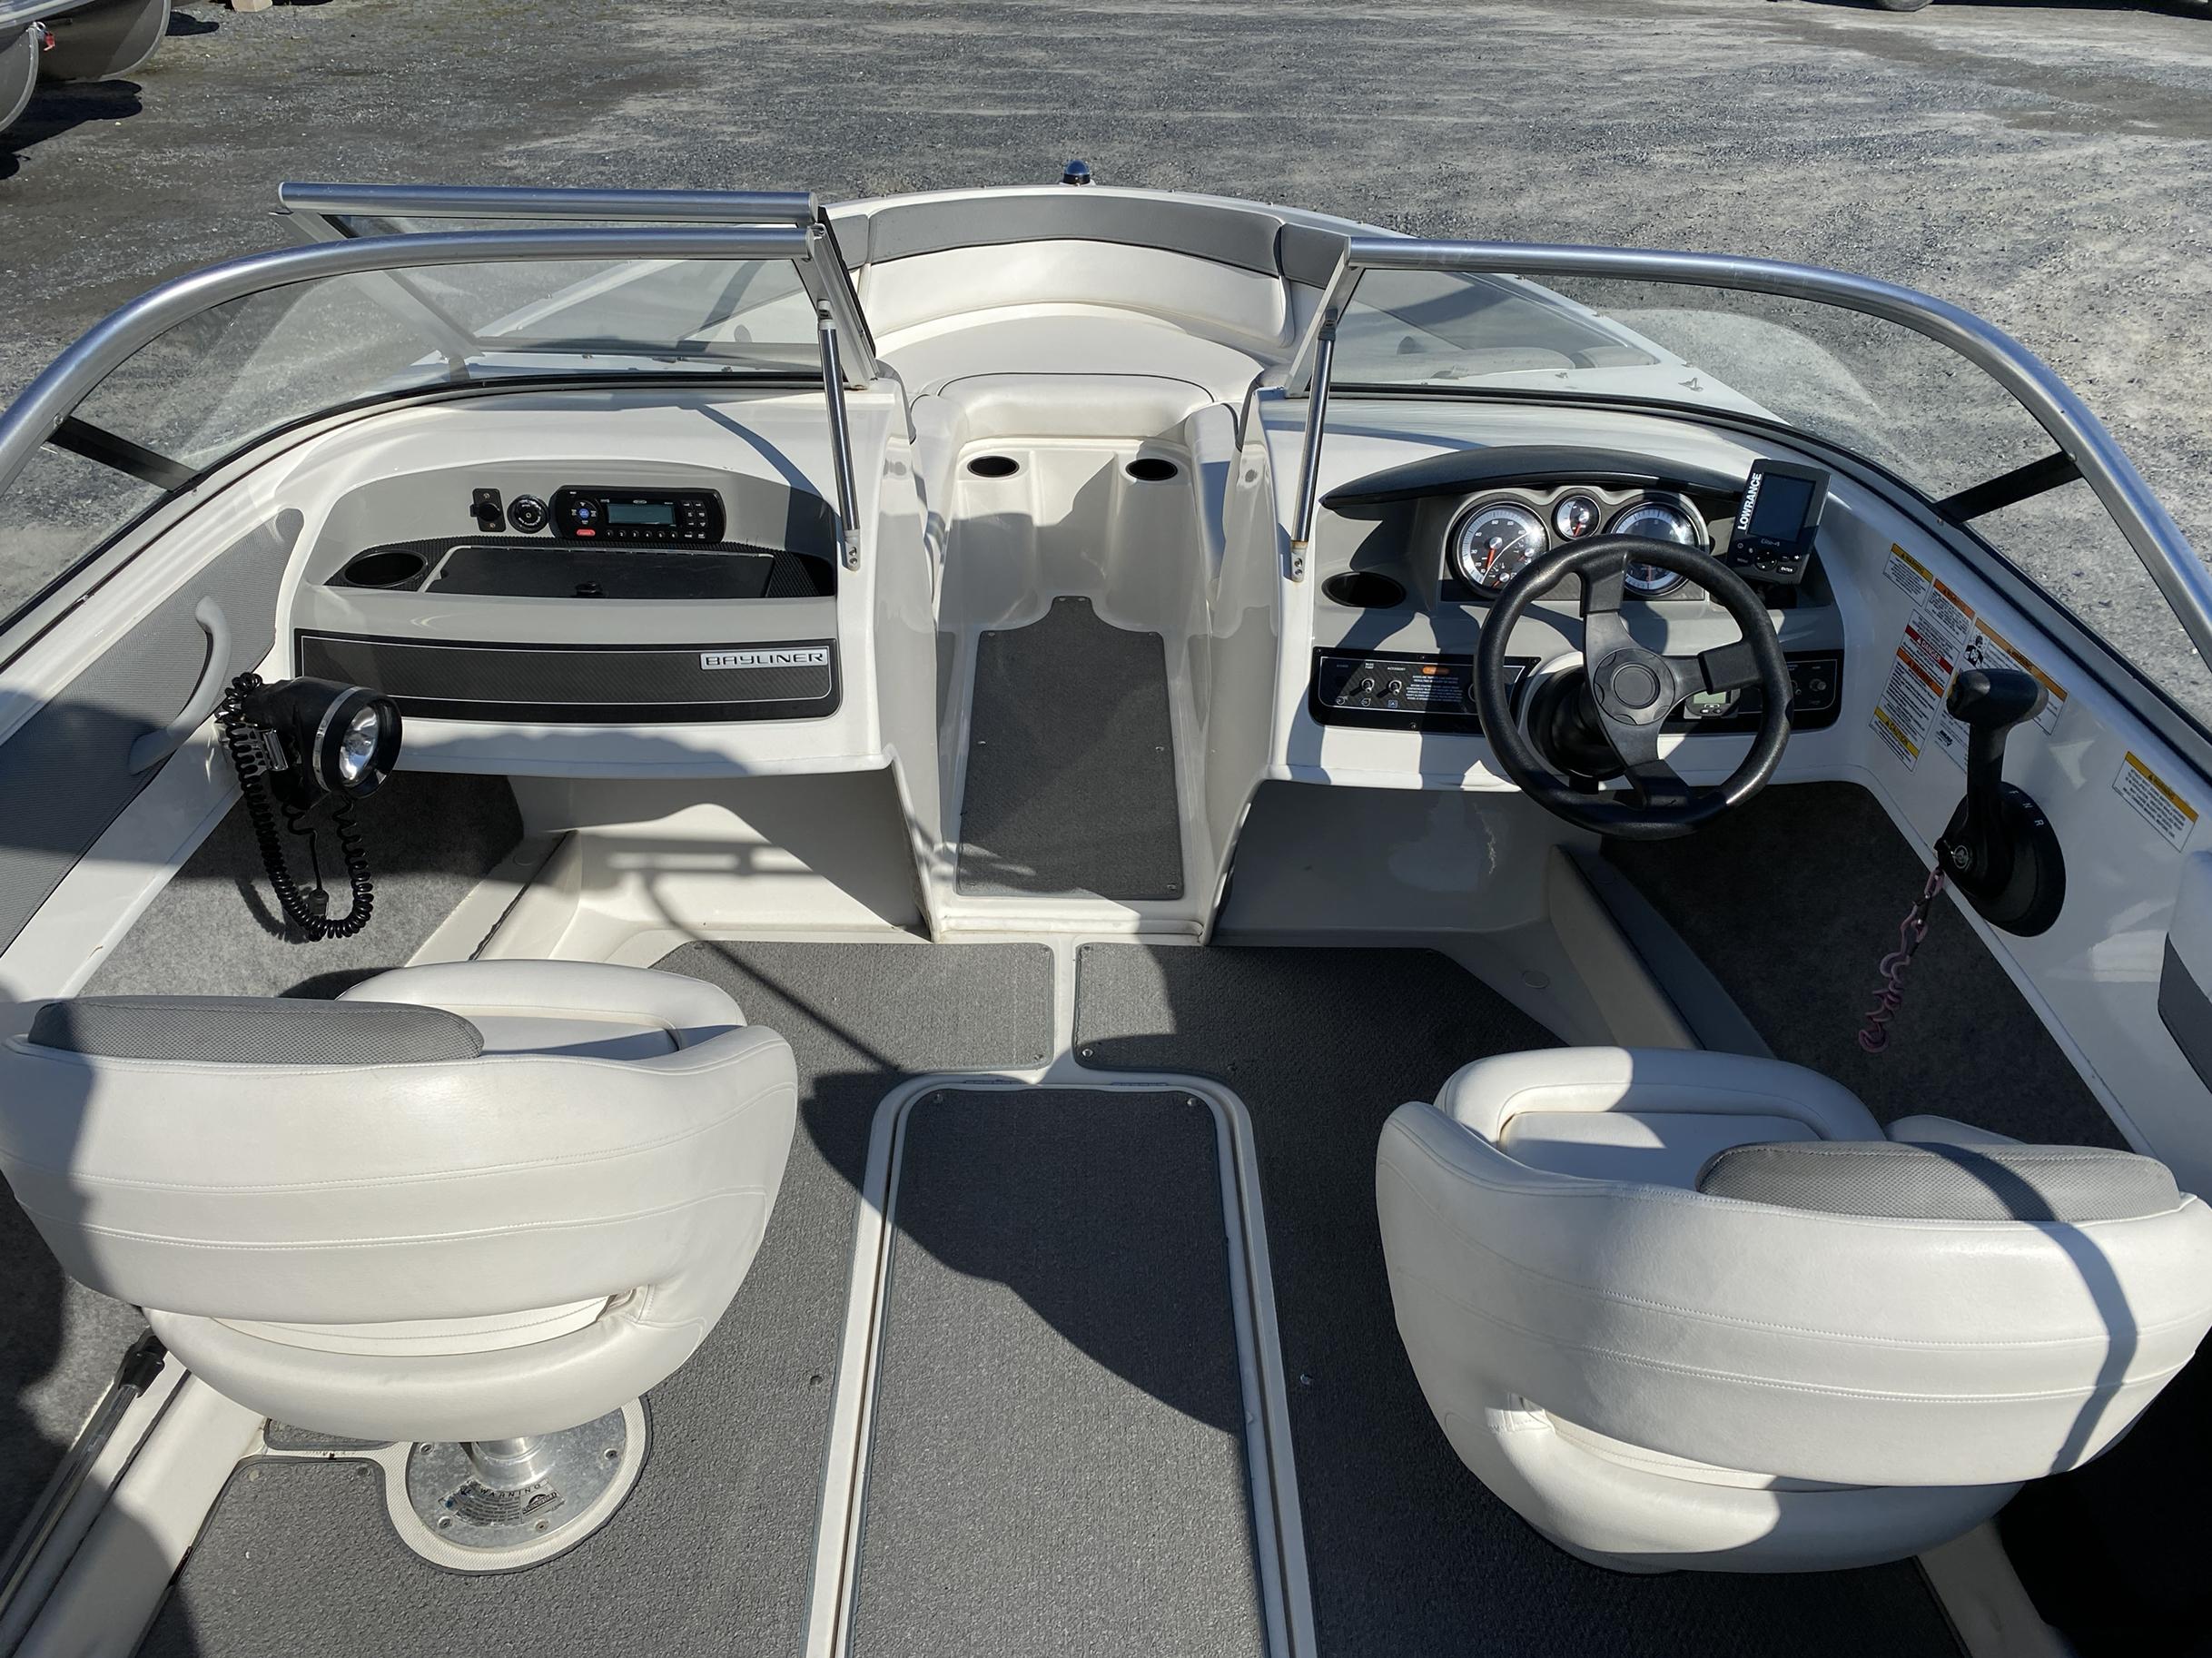 2014 Bayliner boat for sale, model of the boat is 190 Bowrider & Image # 10 of 10